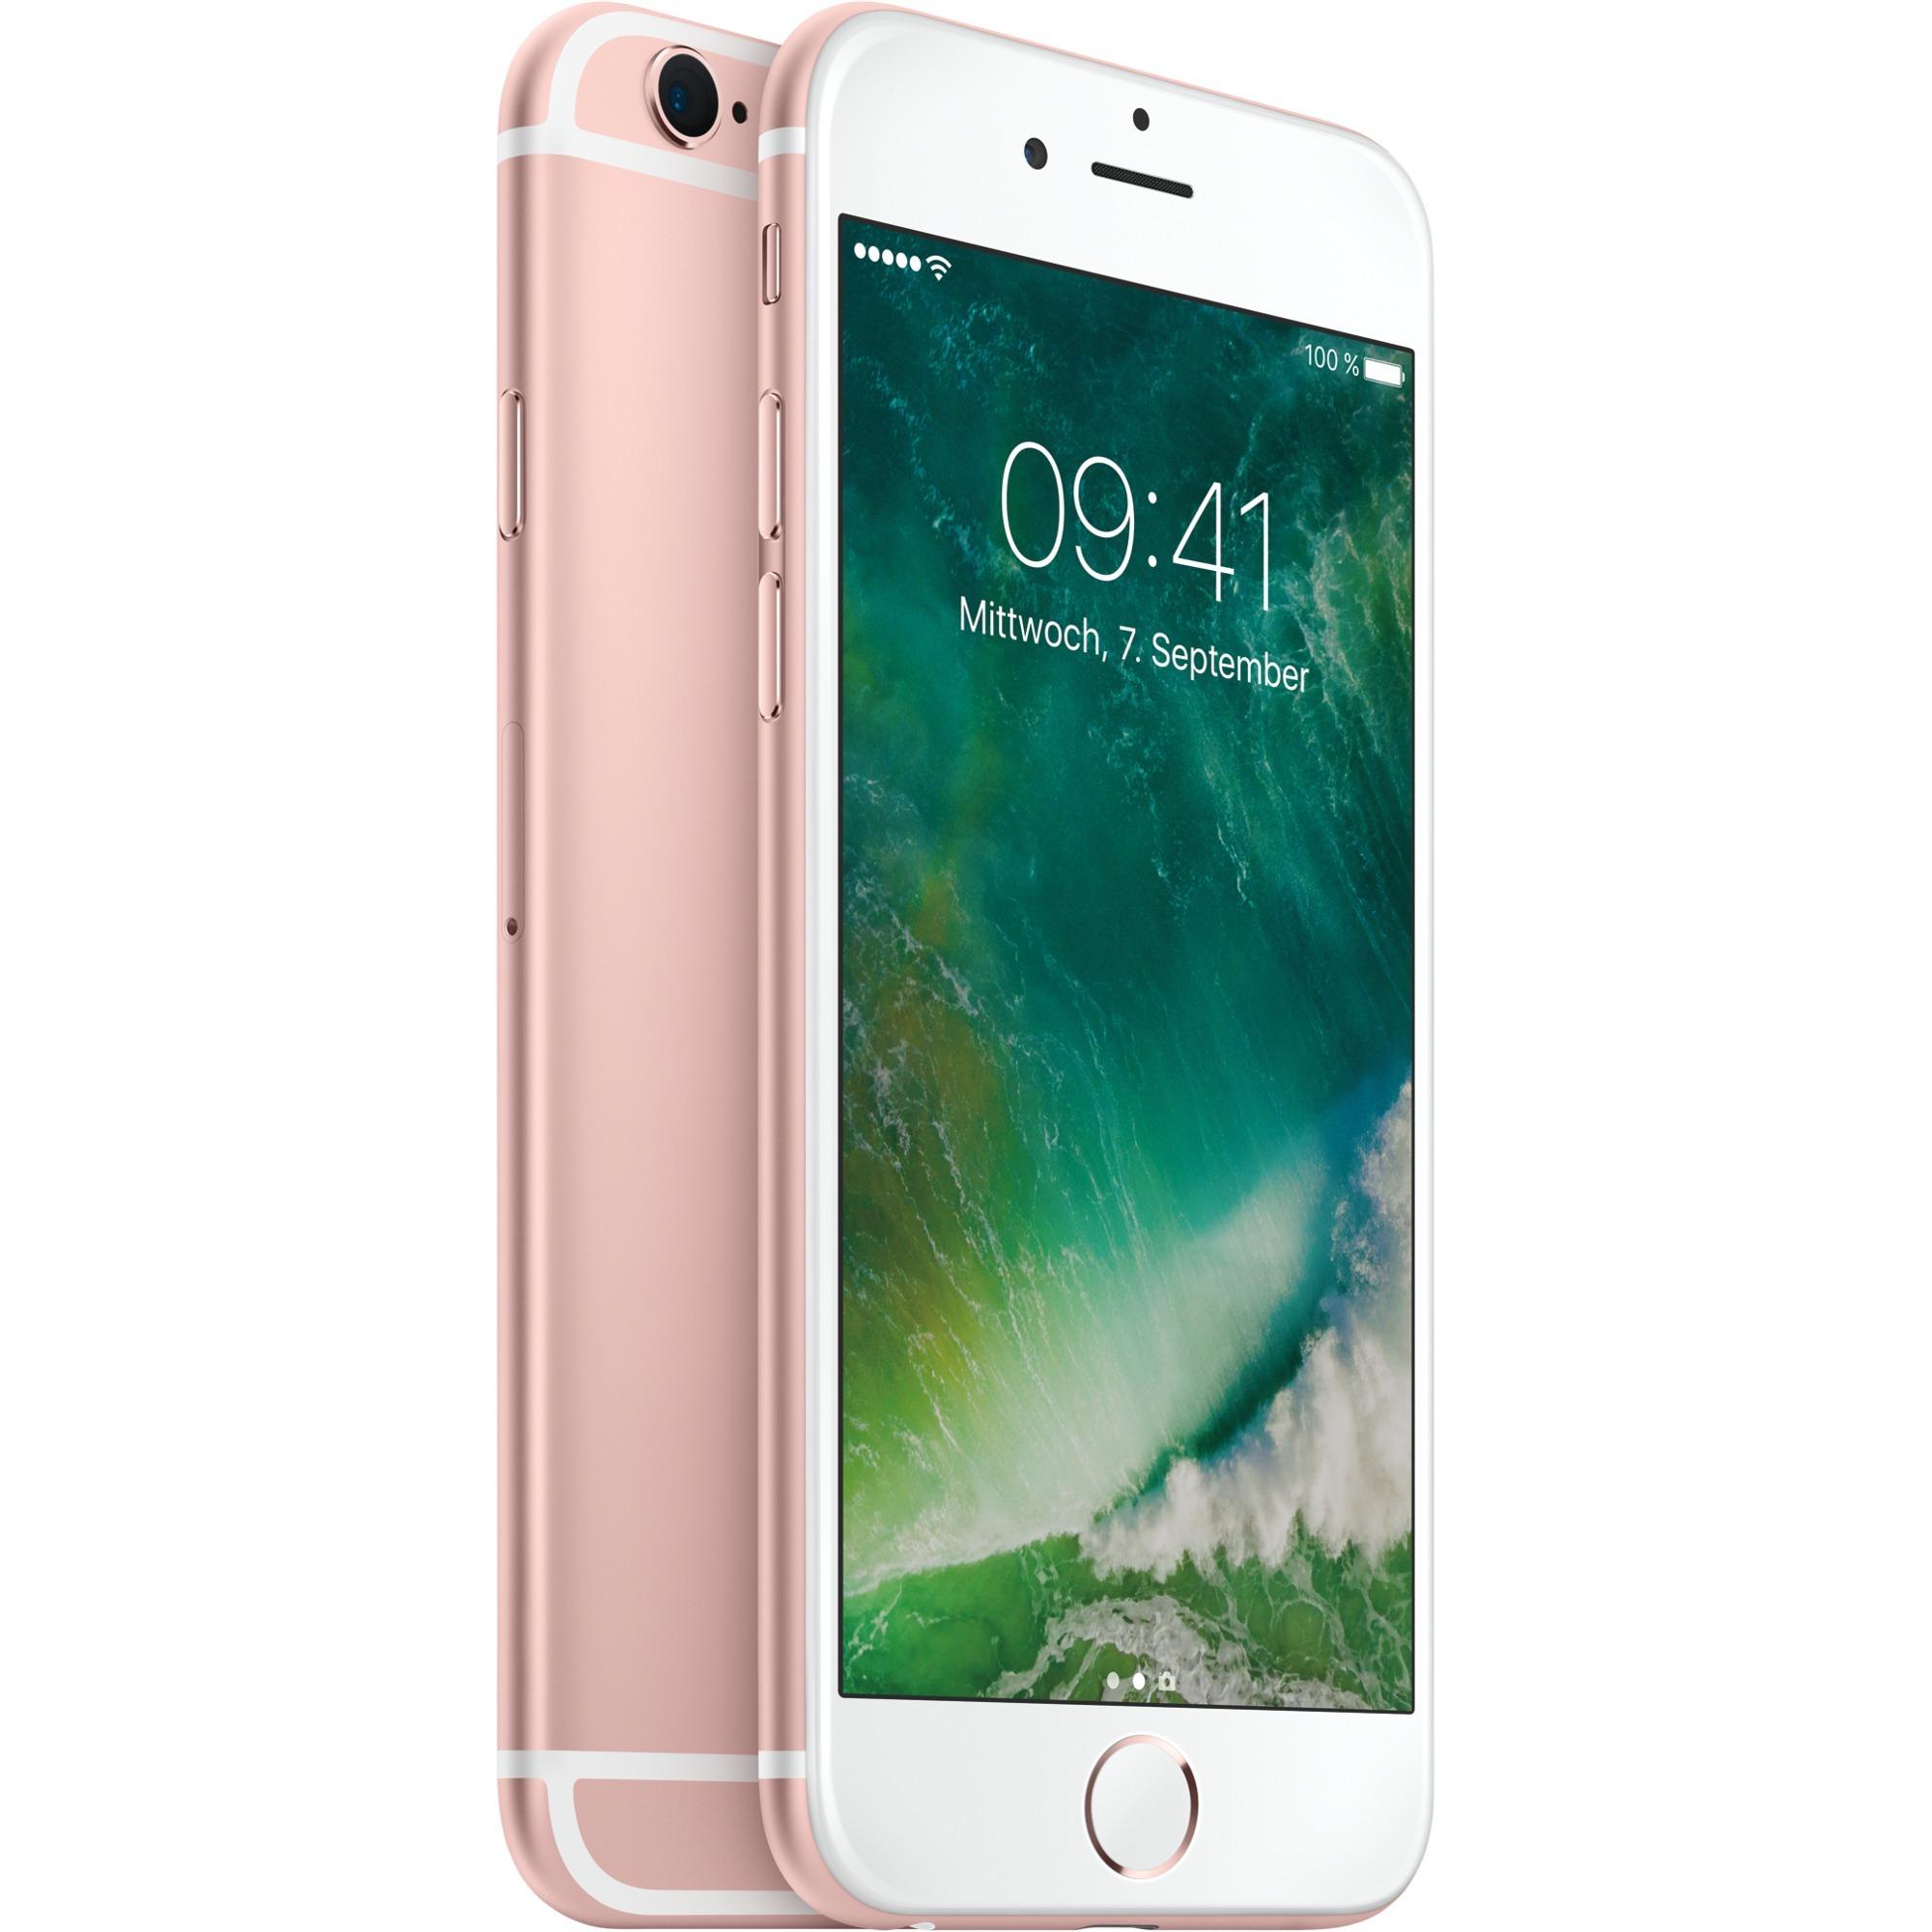 iPhone 6s Single SIM 4G 32GB Lyserød guld, Mobiltelefon